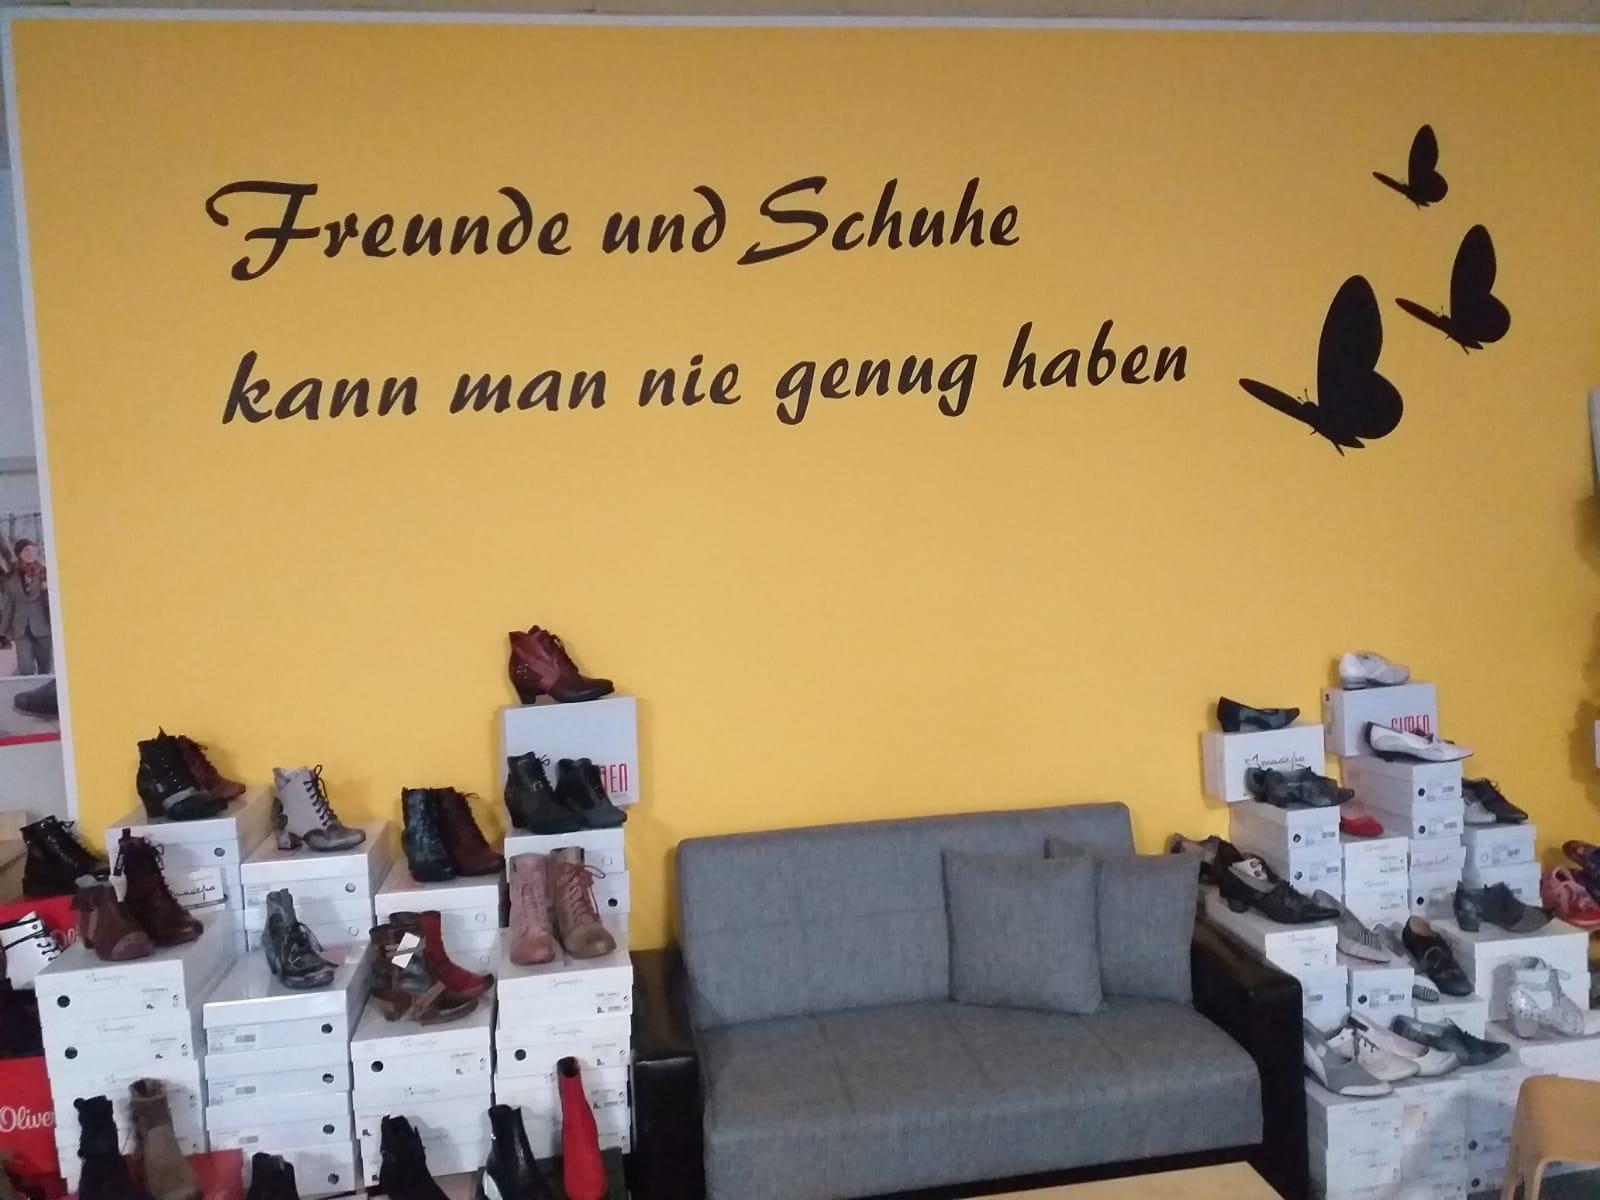 Schuhhaus Gaideczka